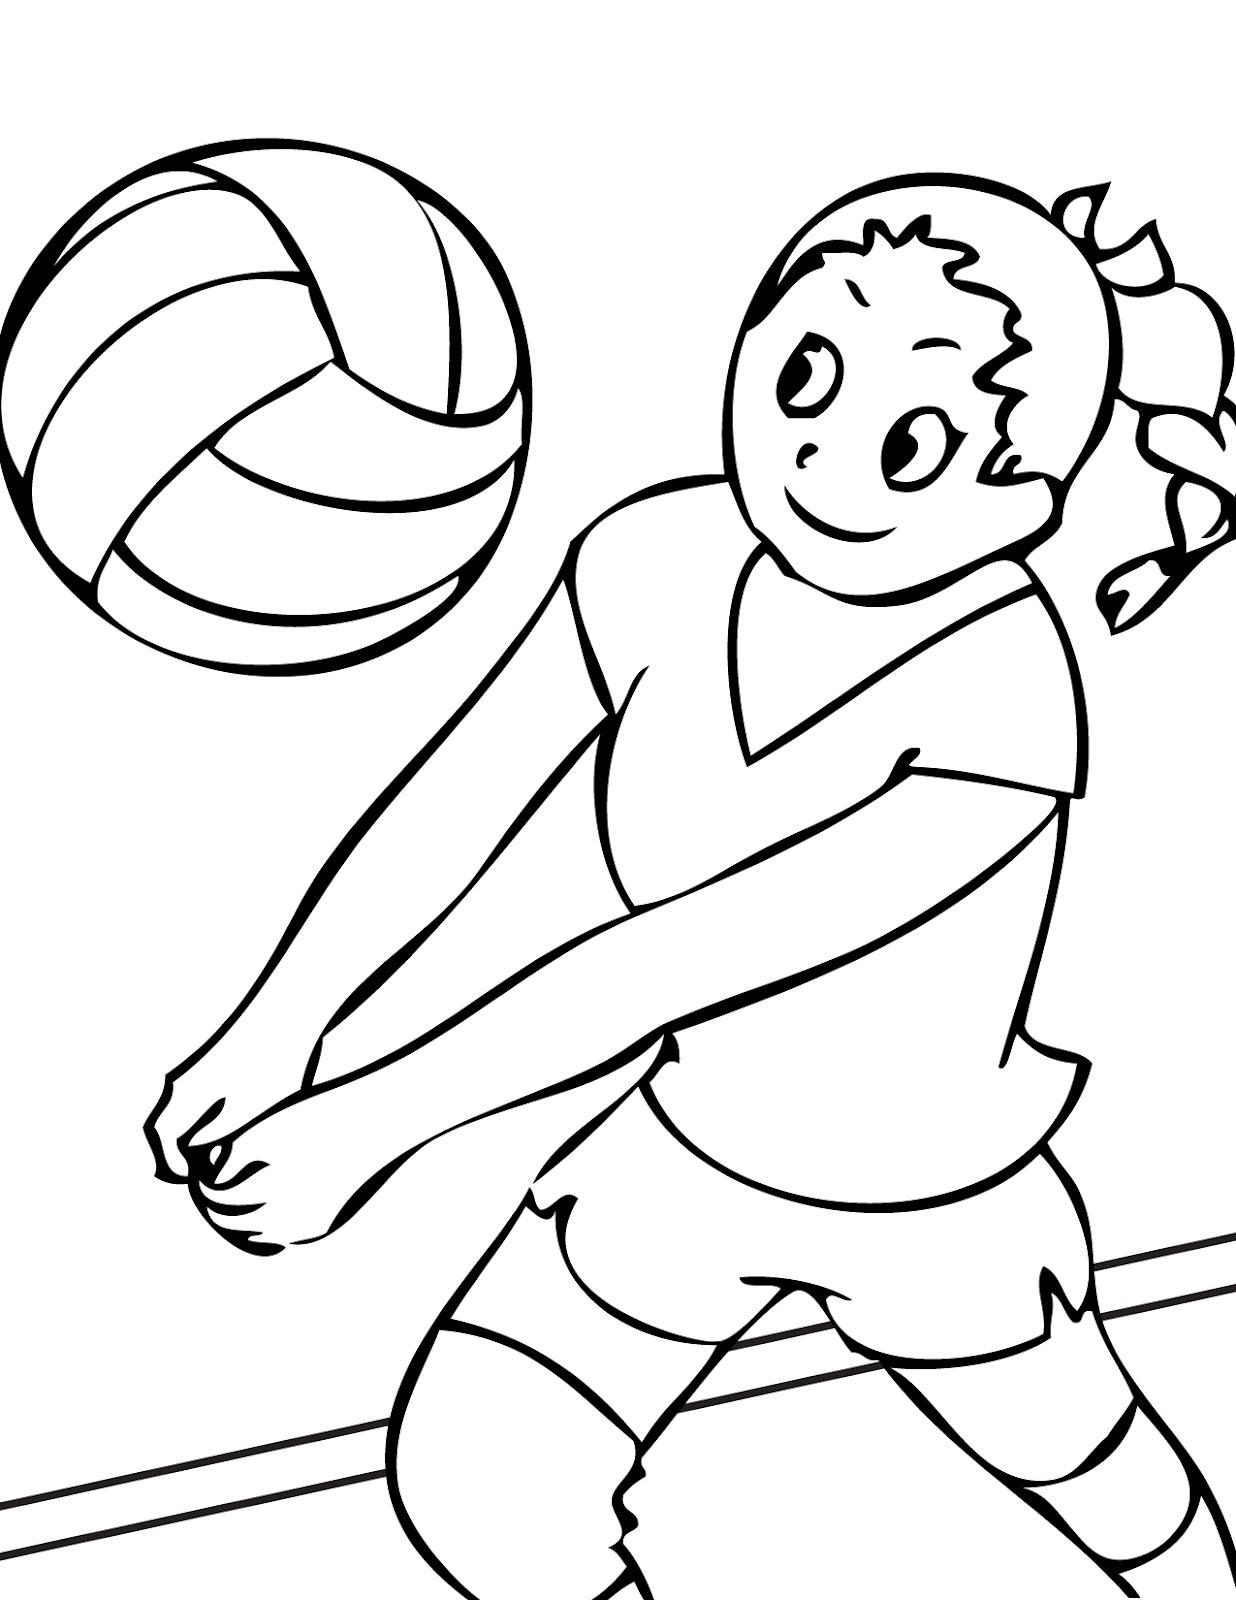 Elementary Physical Education: February 2012